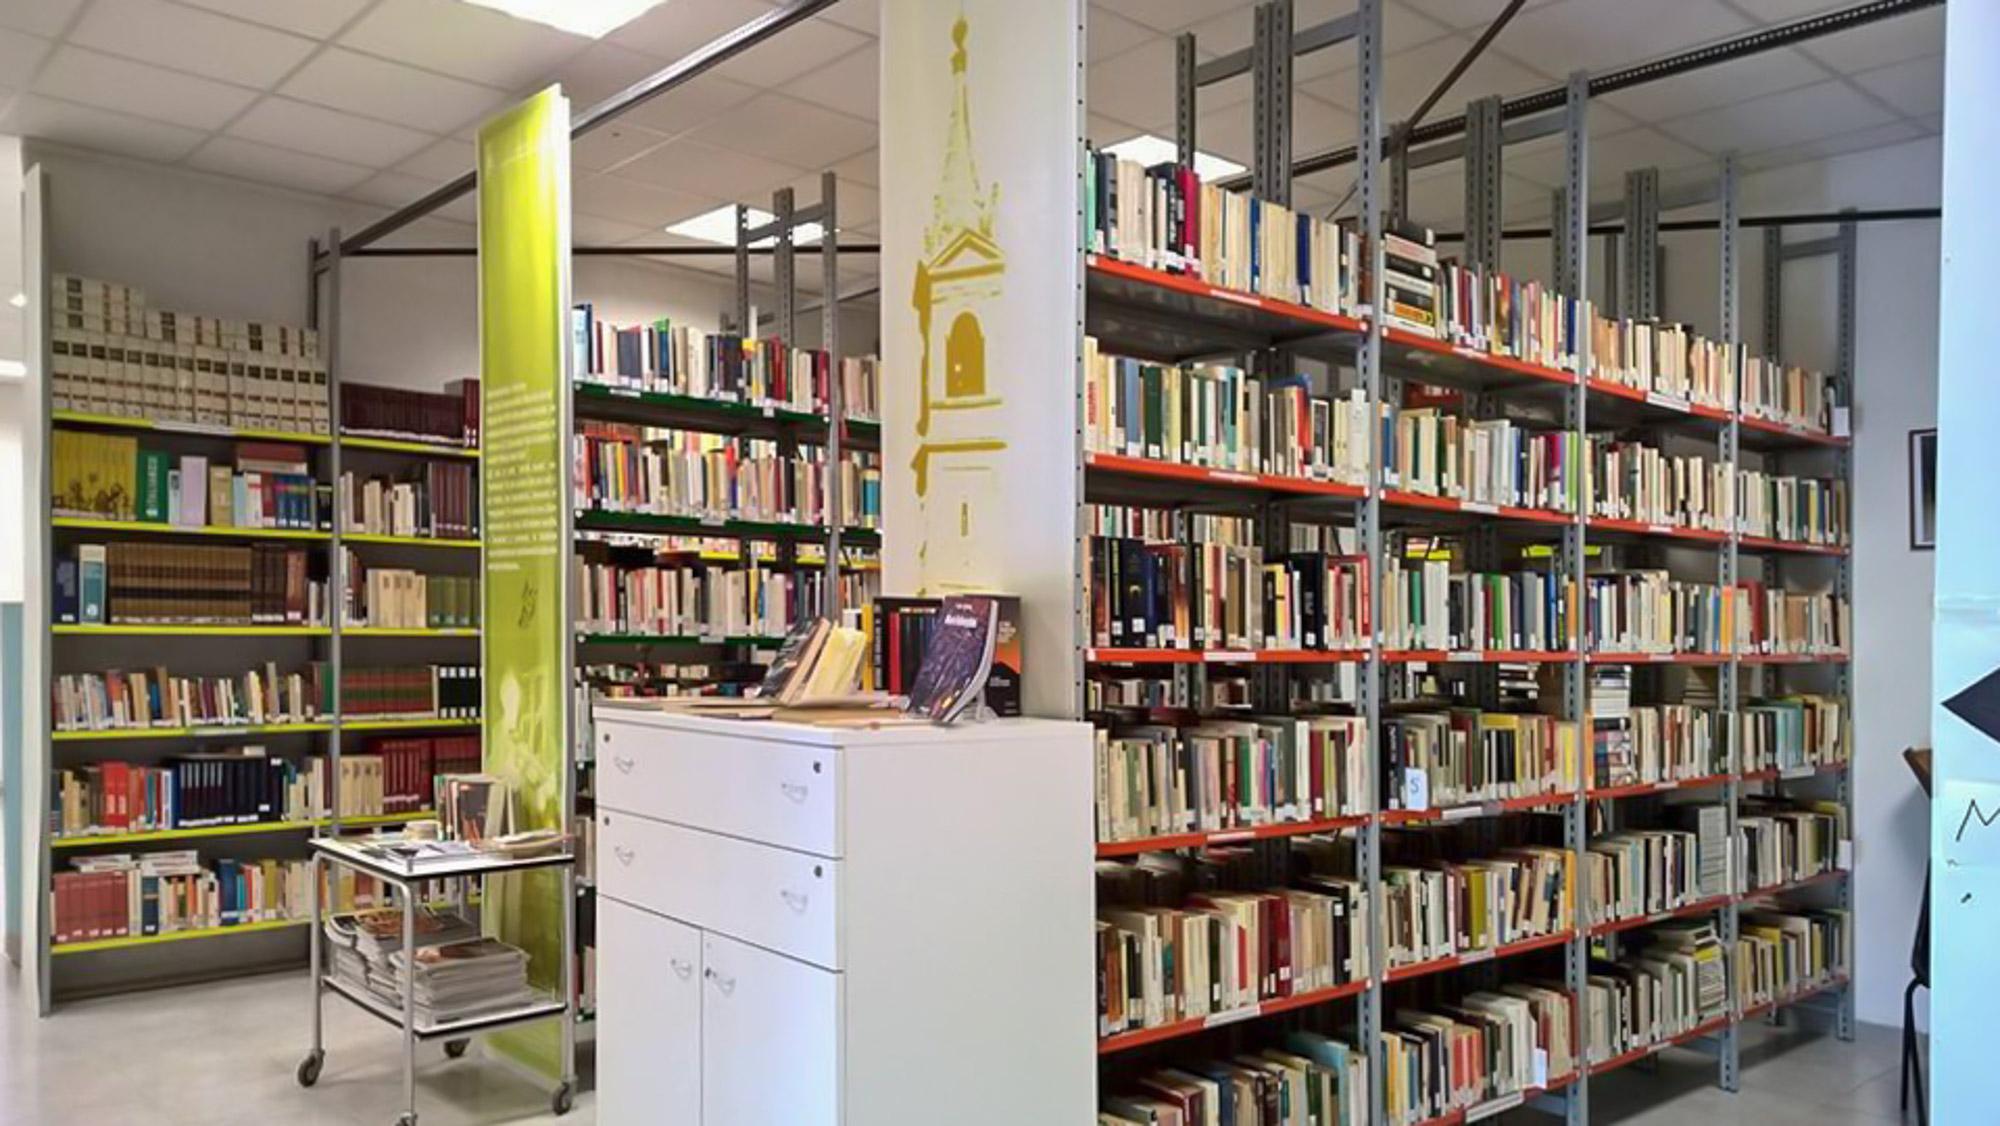 San Benedetto Val di Sambro- Sala biblioteca